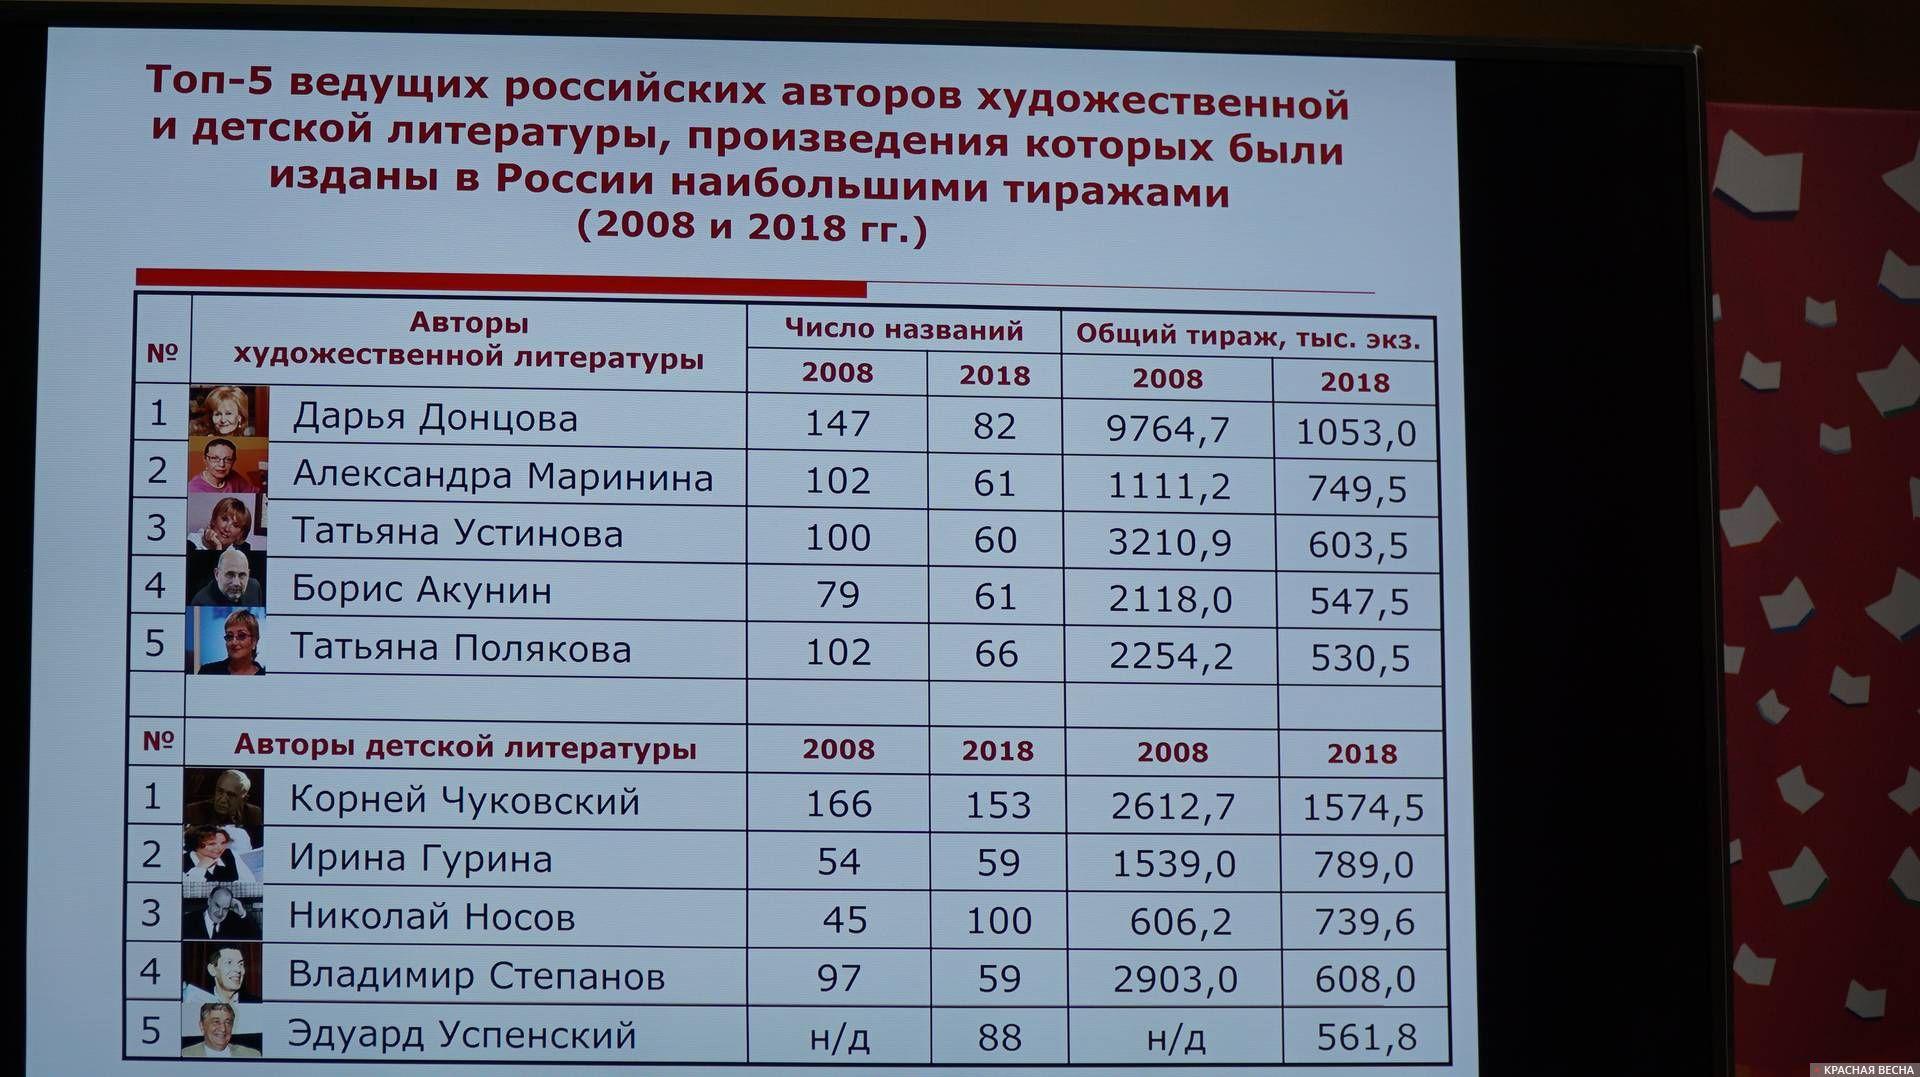 Слайд на презентации доклада. 24.05.2019. Санкт-Петербург